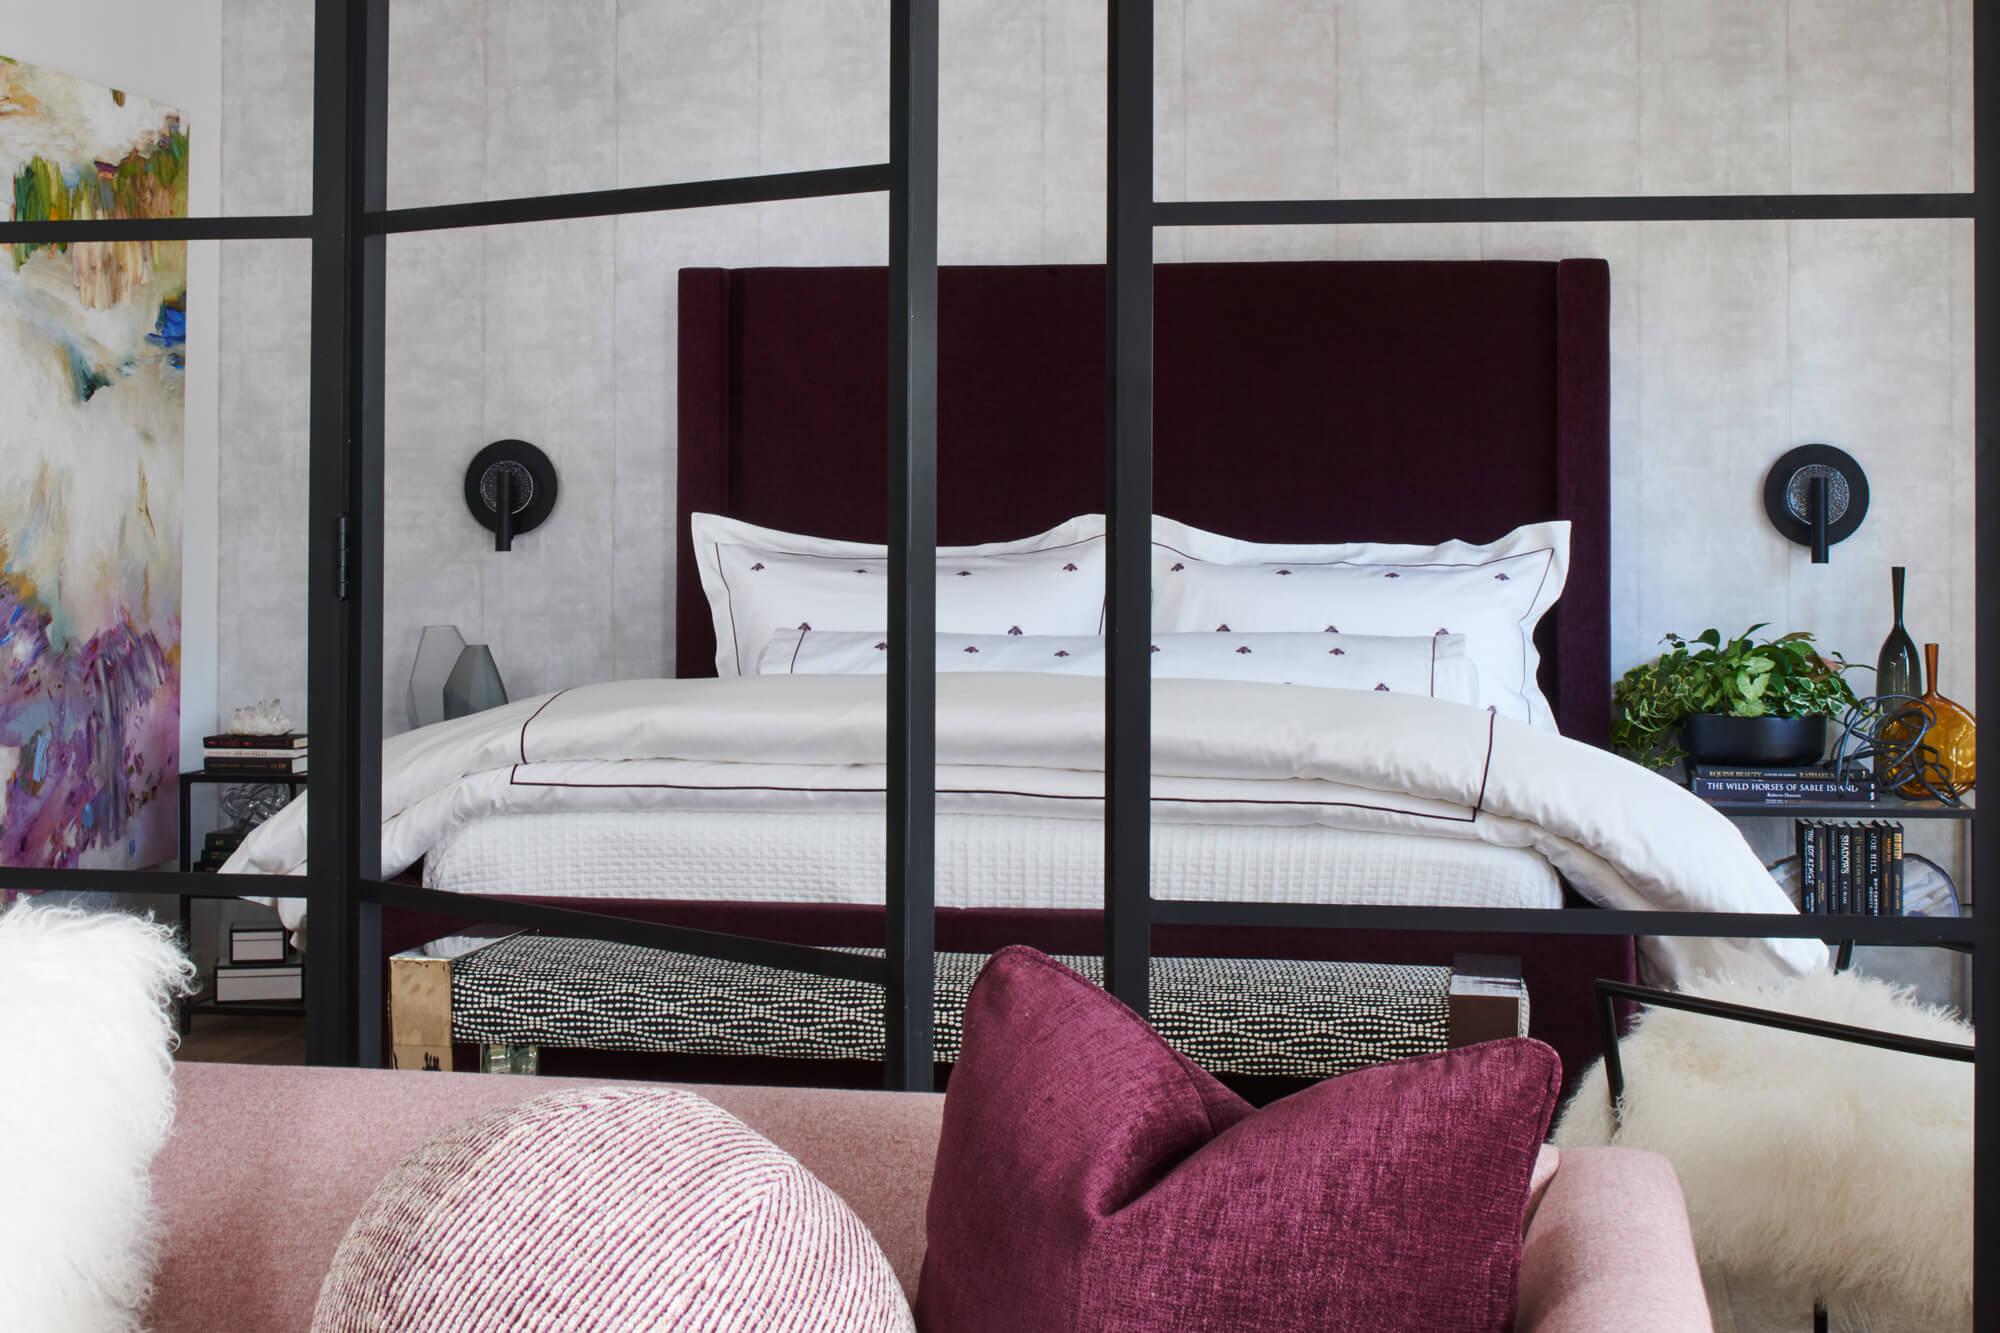 Guest house, Pasadena Showcase House, Designer: L2 Interiors, Photographer: Peter Christiansen Valli